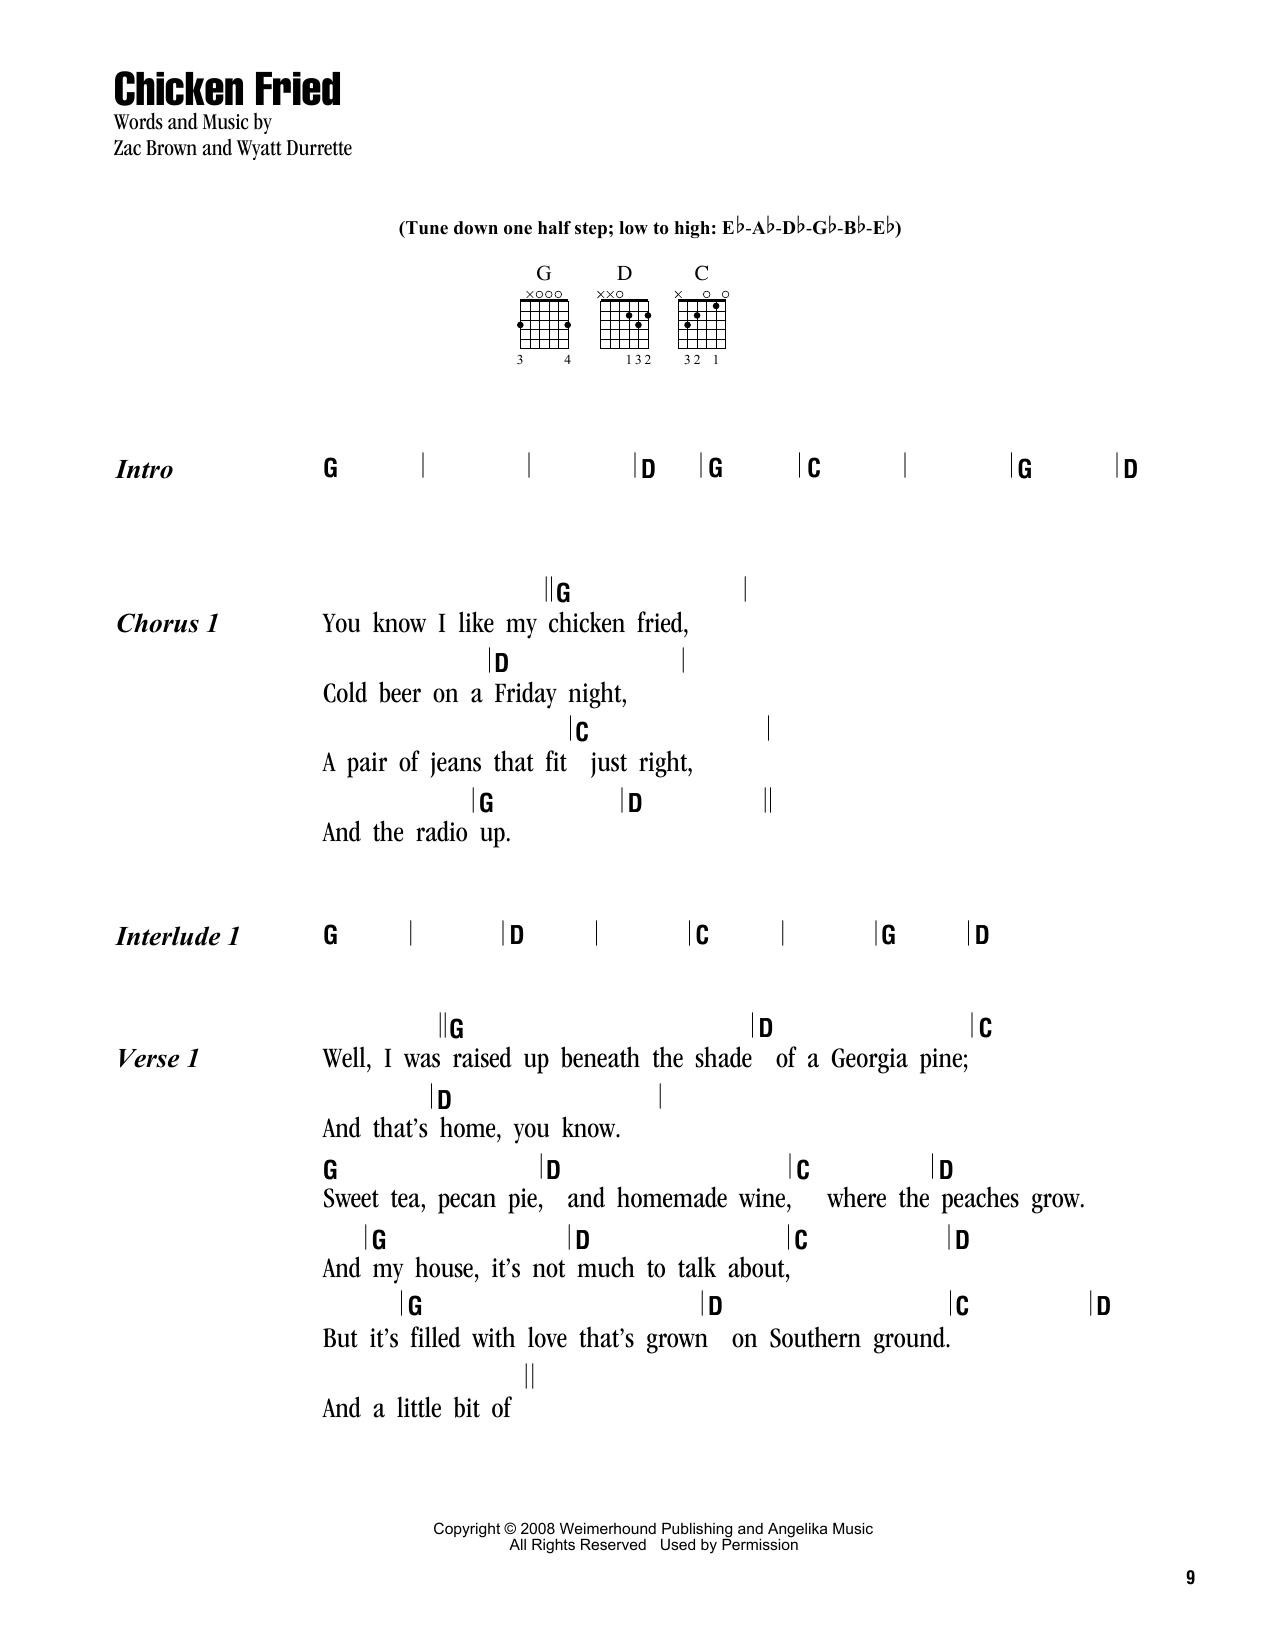 Sheet Music Digital Files To Print Licensed Zac Brown Band Digital